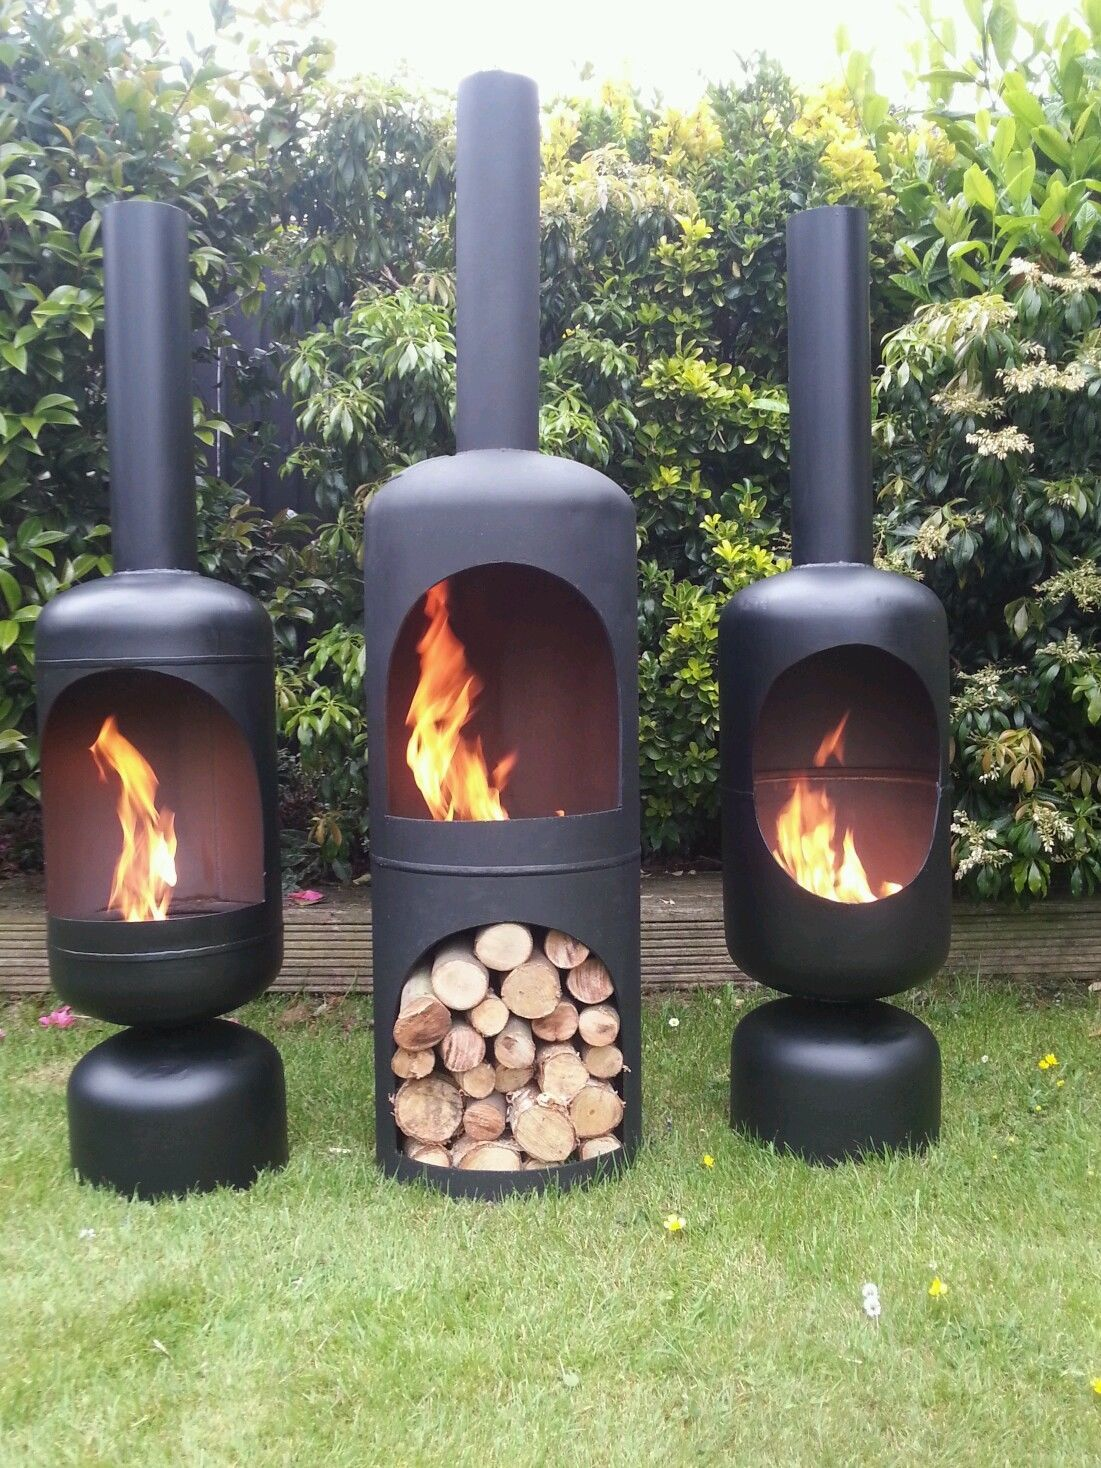 Gas Bottle Wood Burner Log Burner Chiminea Patio Heater Fire